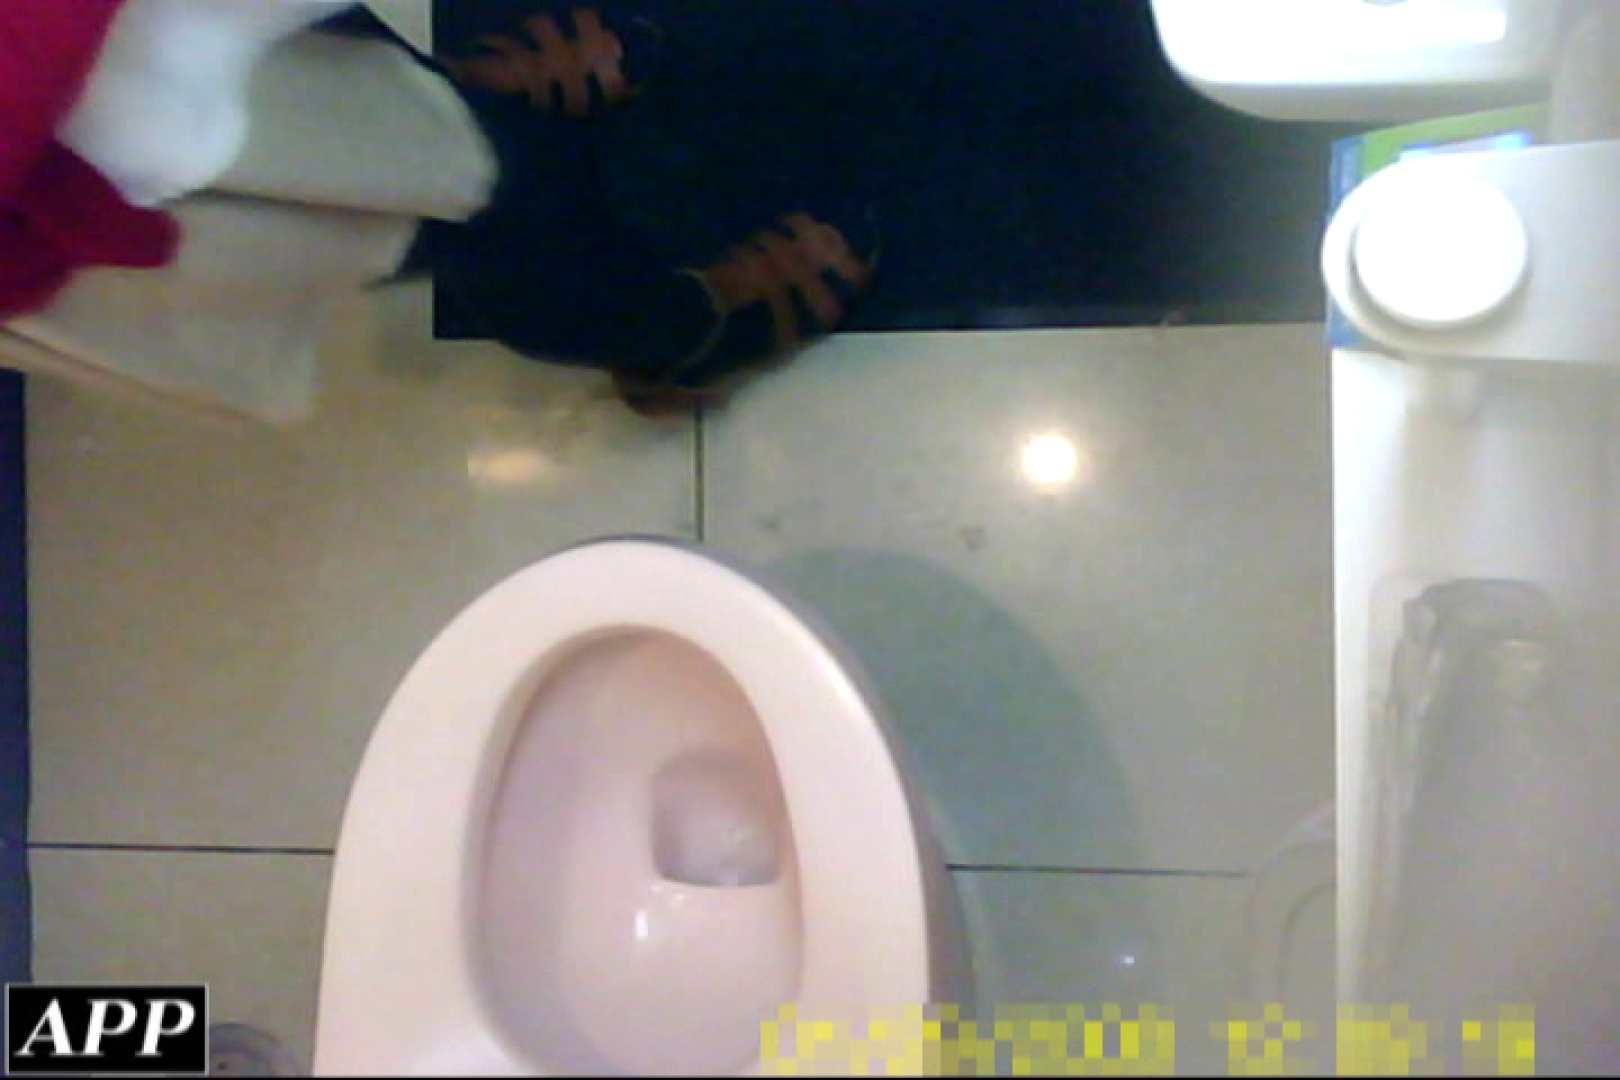 3視点洗面所 vol.110 OLハメ撮り  111Pix 28